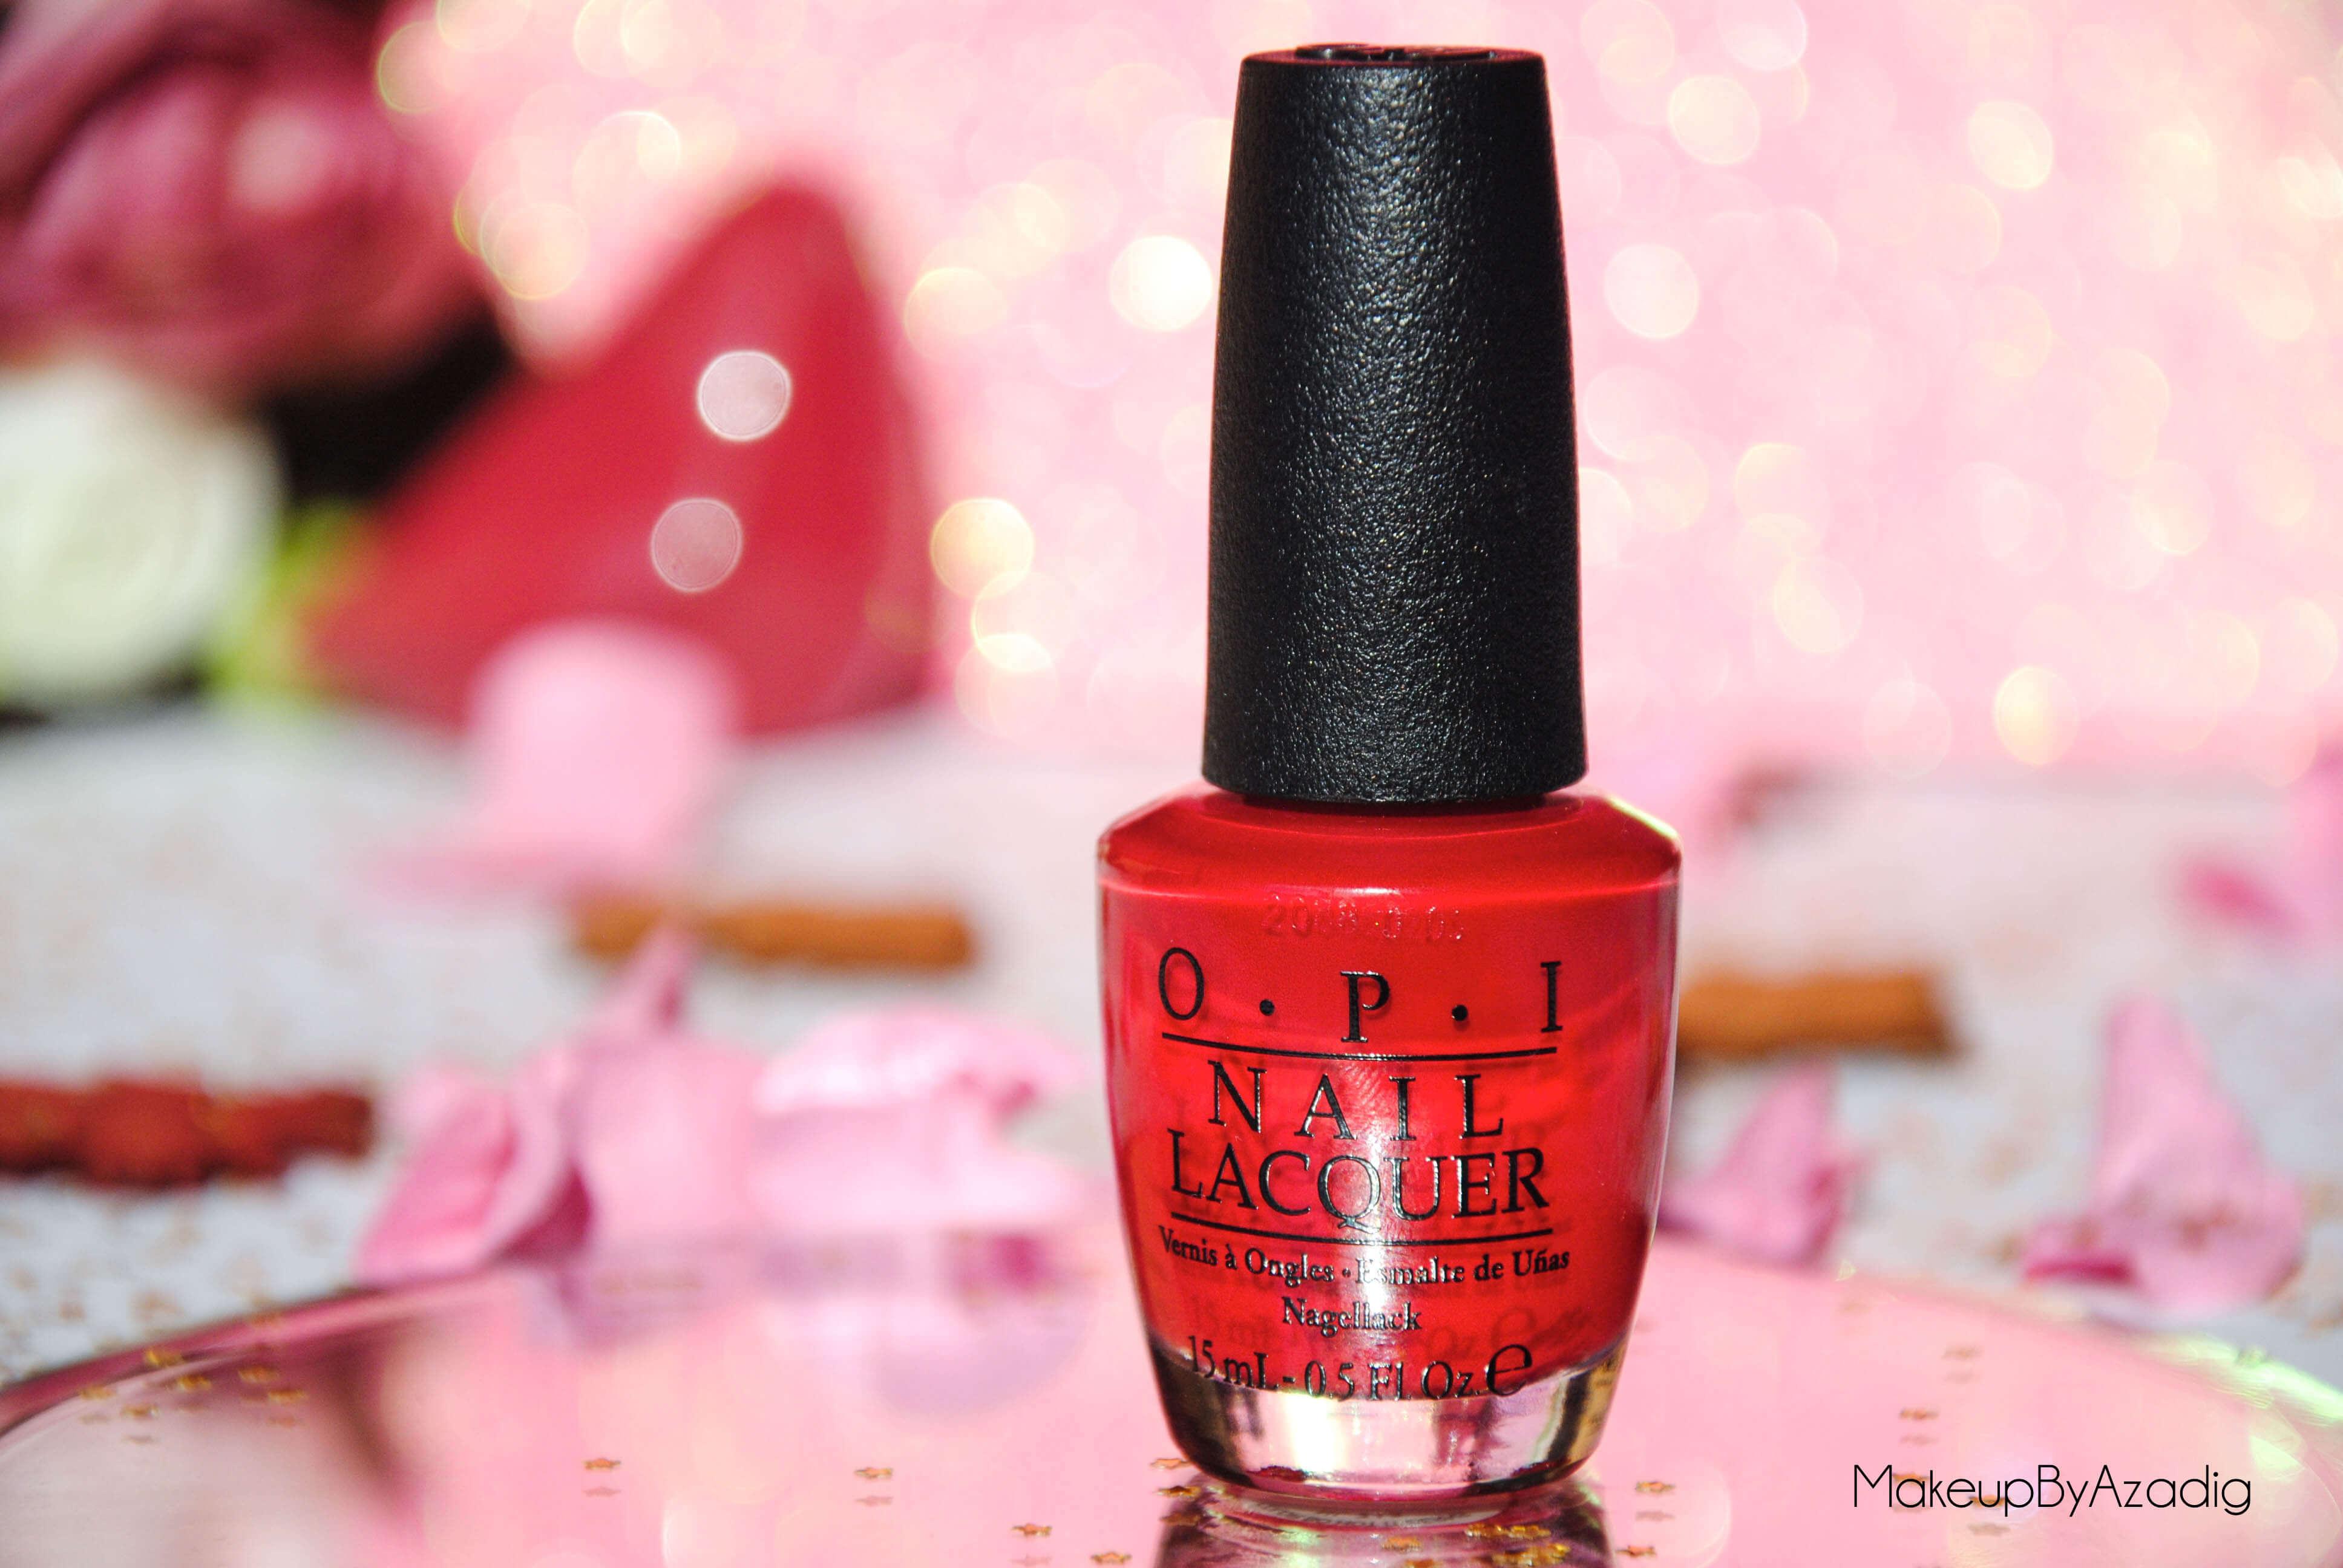 makeupbyazadig-vernis-tendance-automne-nails-autumn-formula-x-monop-makeup-troyes-dijon-paris-sandrea26france-camaieu-opi-kiko-sephora-mavala-essie-lacquer